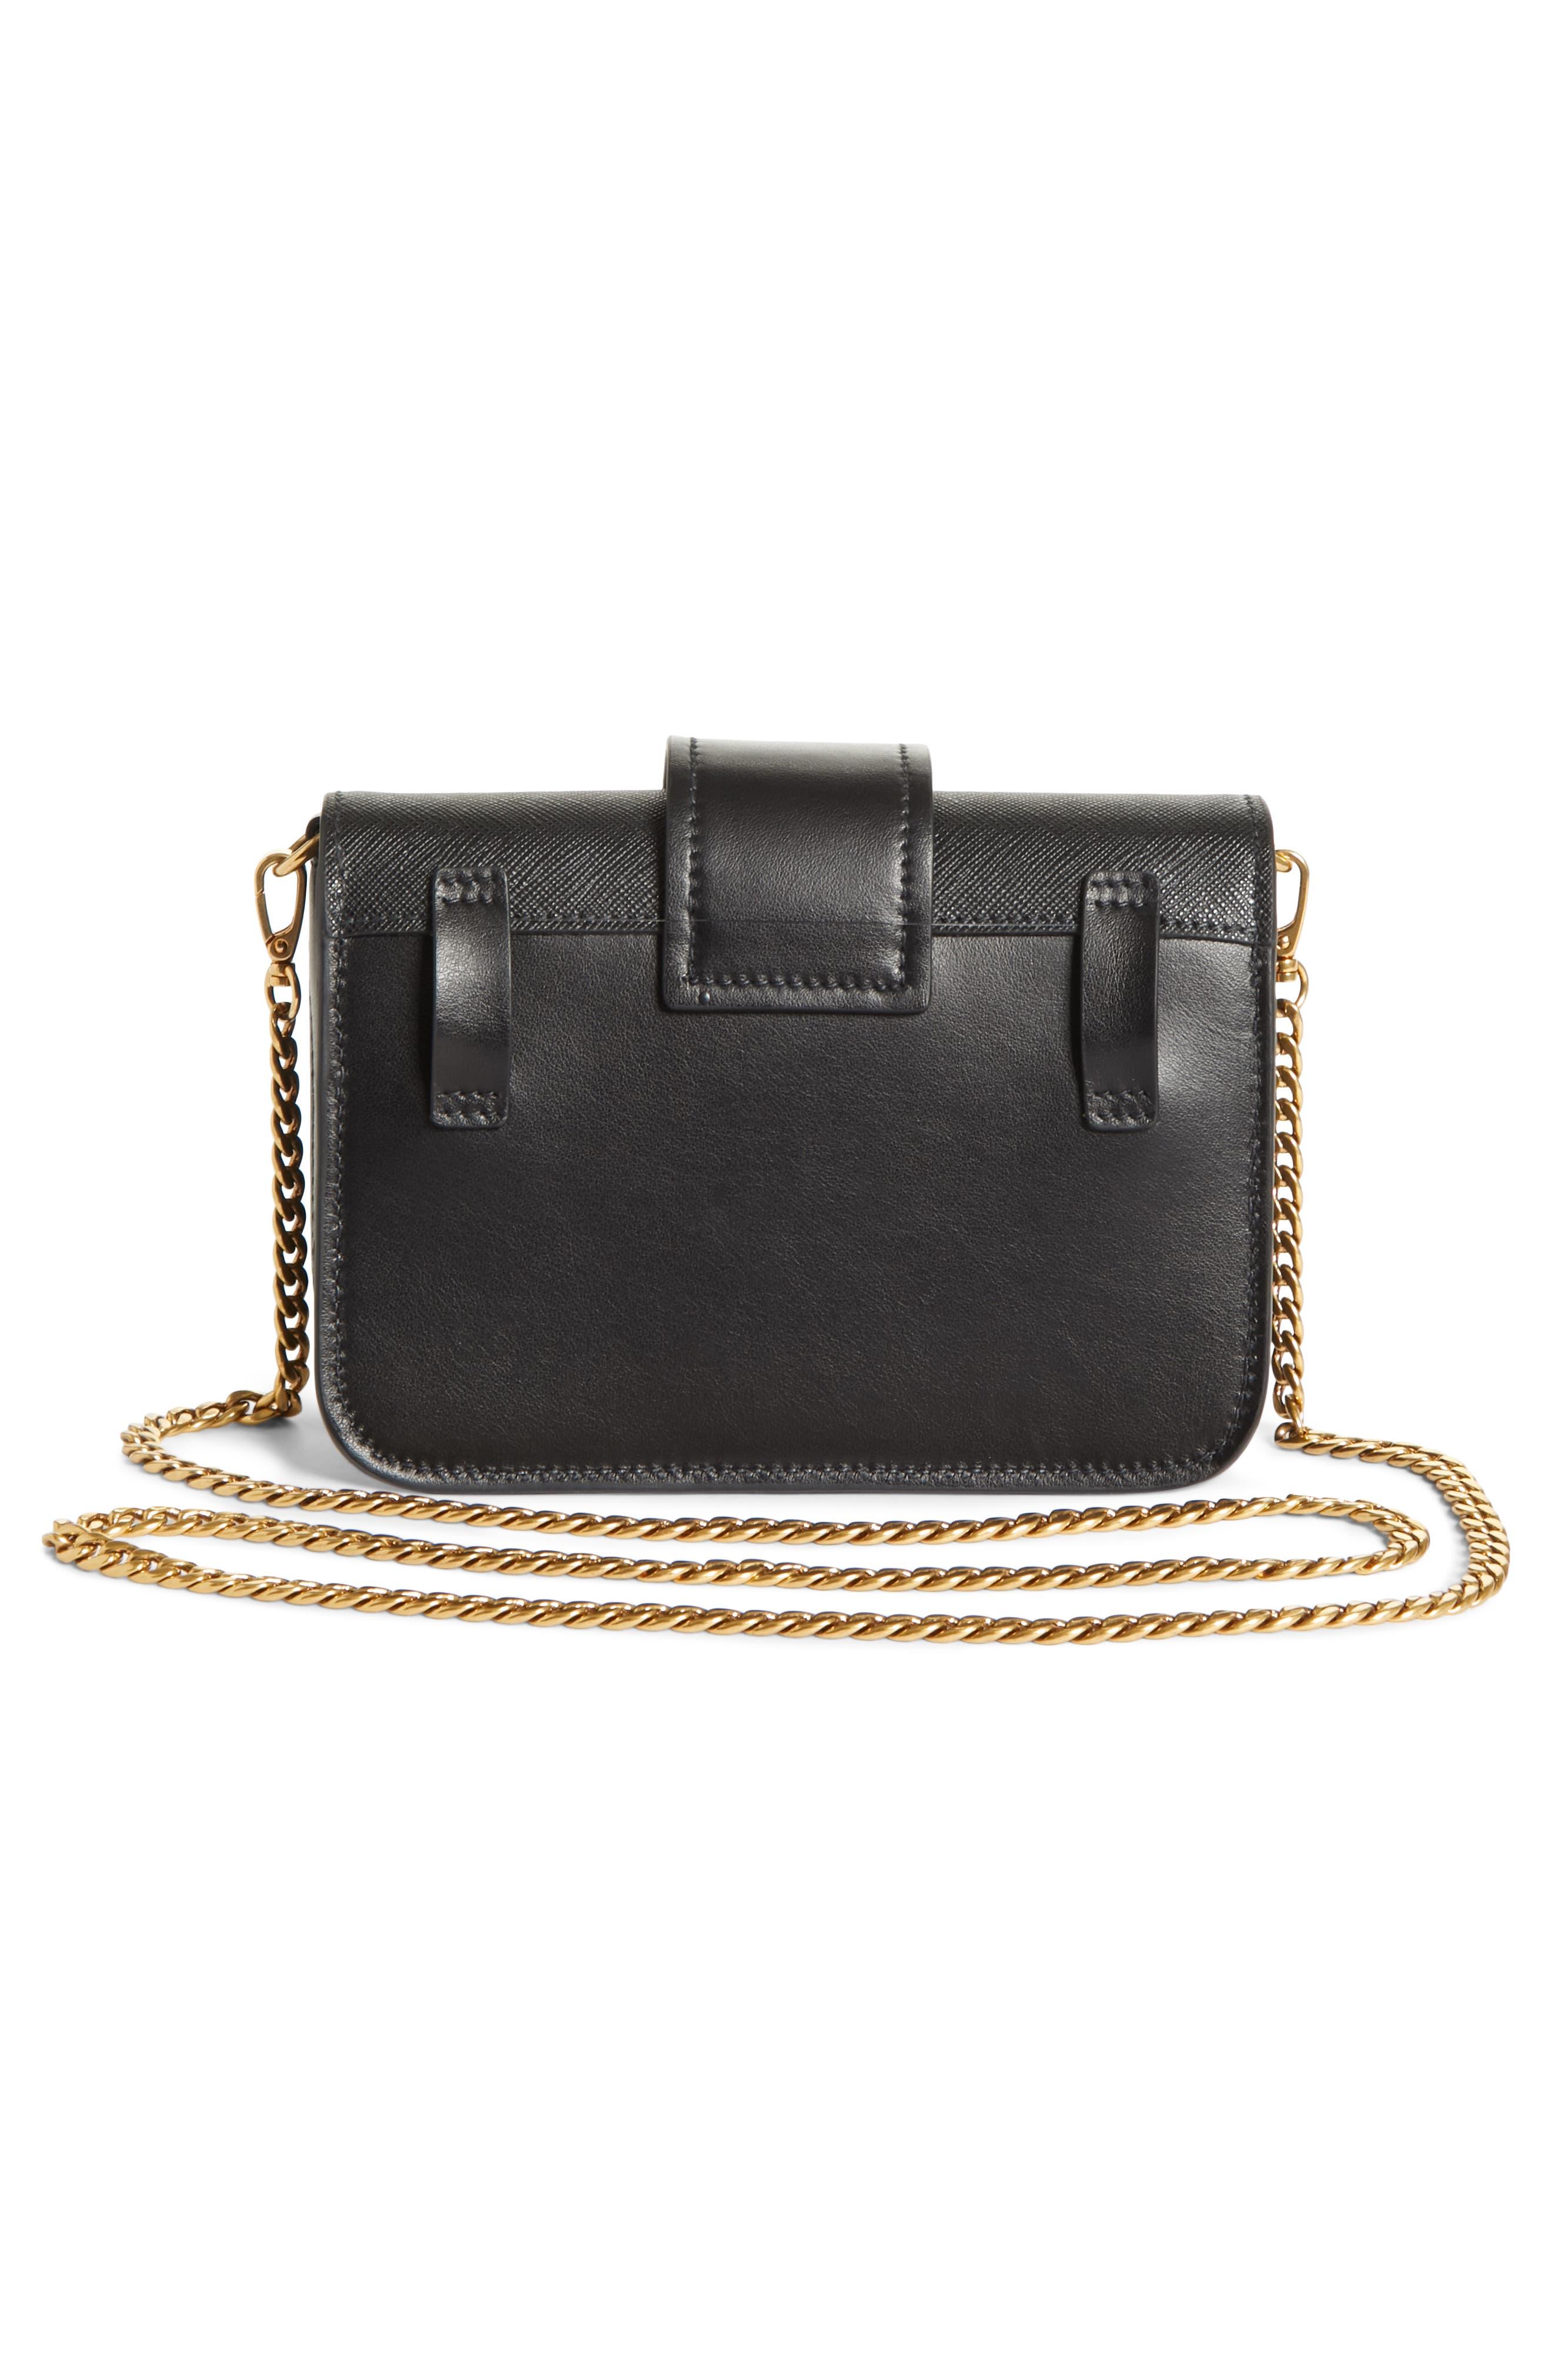 Cahier Calfskin Leather Convertible Belt Bag,                             Alternate thumbnail 3, color,                             001